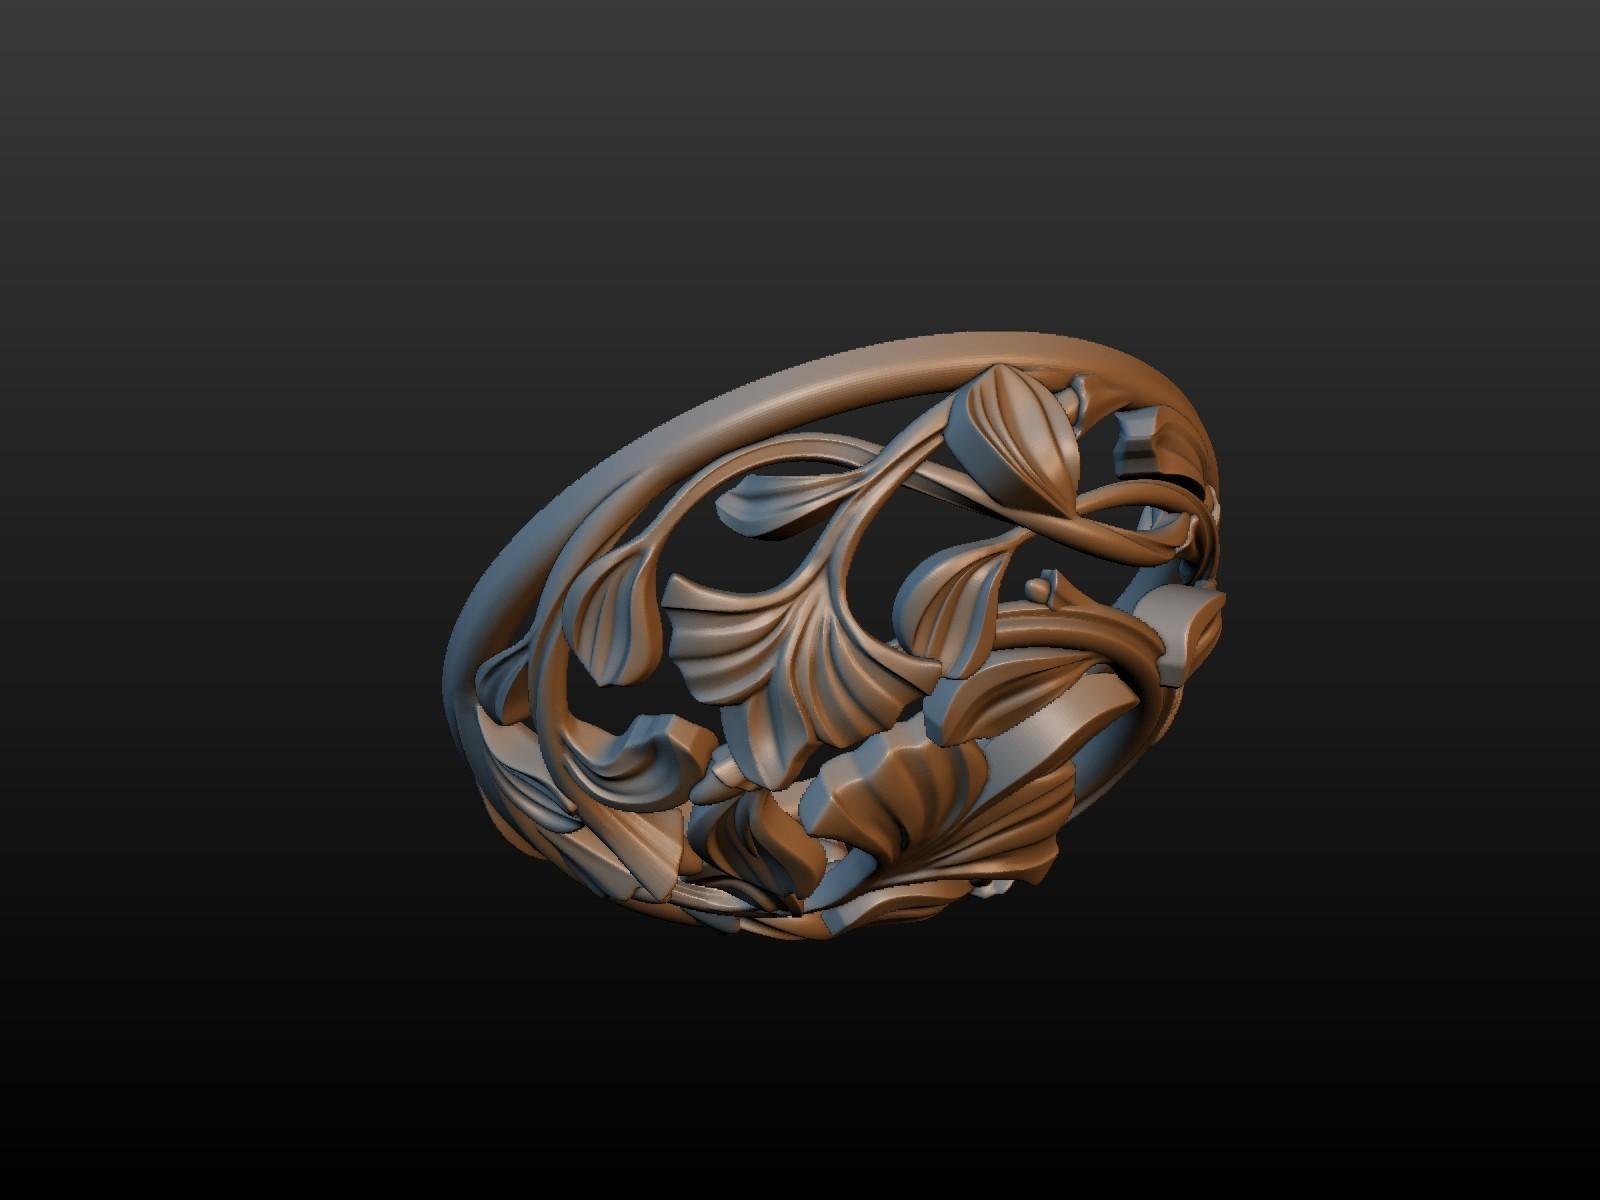 Earring-05.jpg Download STL file Earring • 3D printing template, Skazok